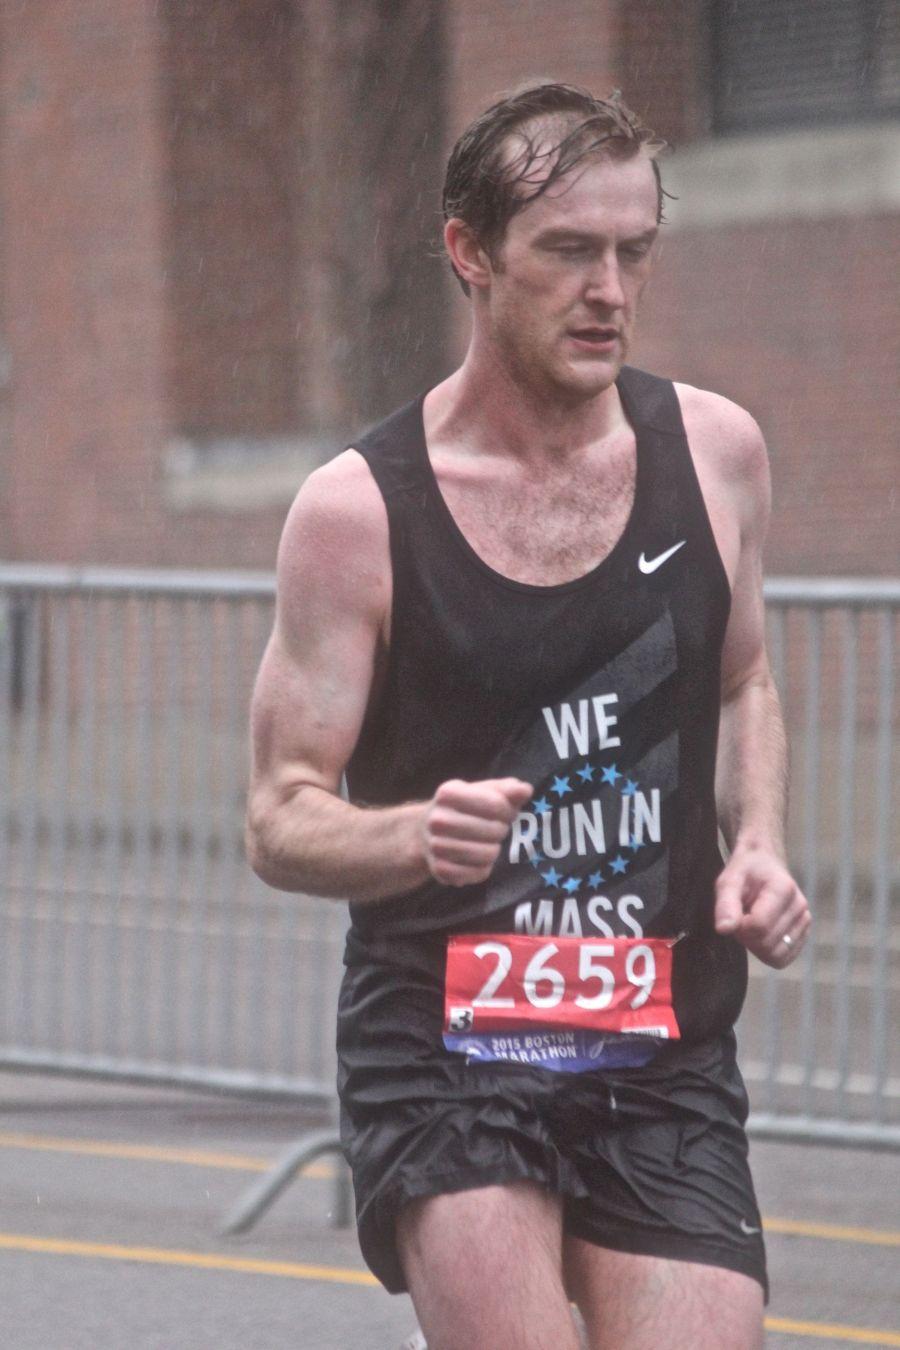 boston marathon april 20 2015 racer number 2659